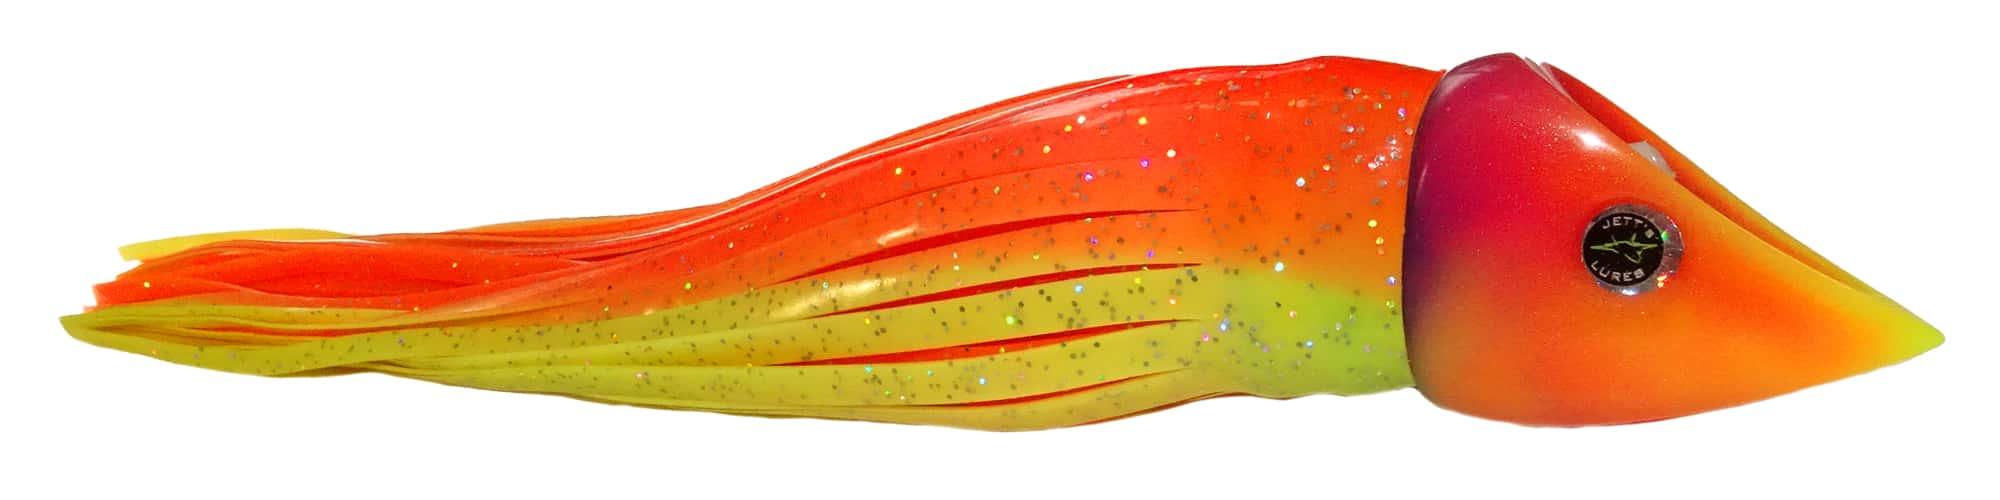 Jetts Lures - Wedgie Series - Skirted - Orange Yellow Punky Scheme